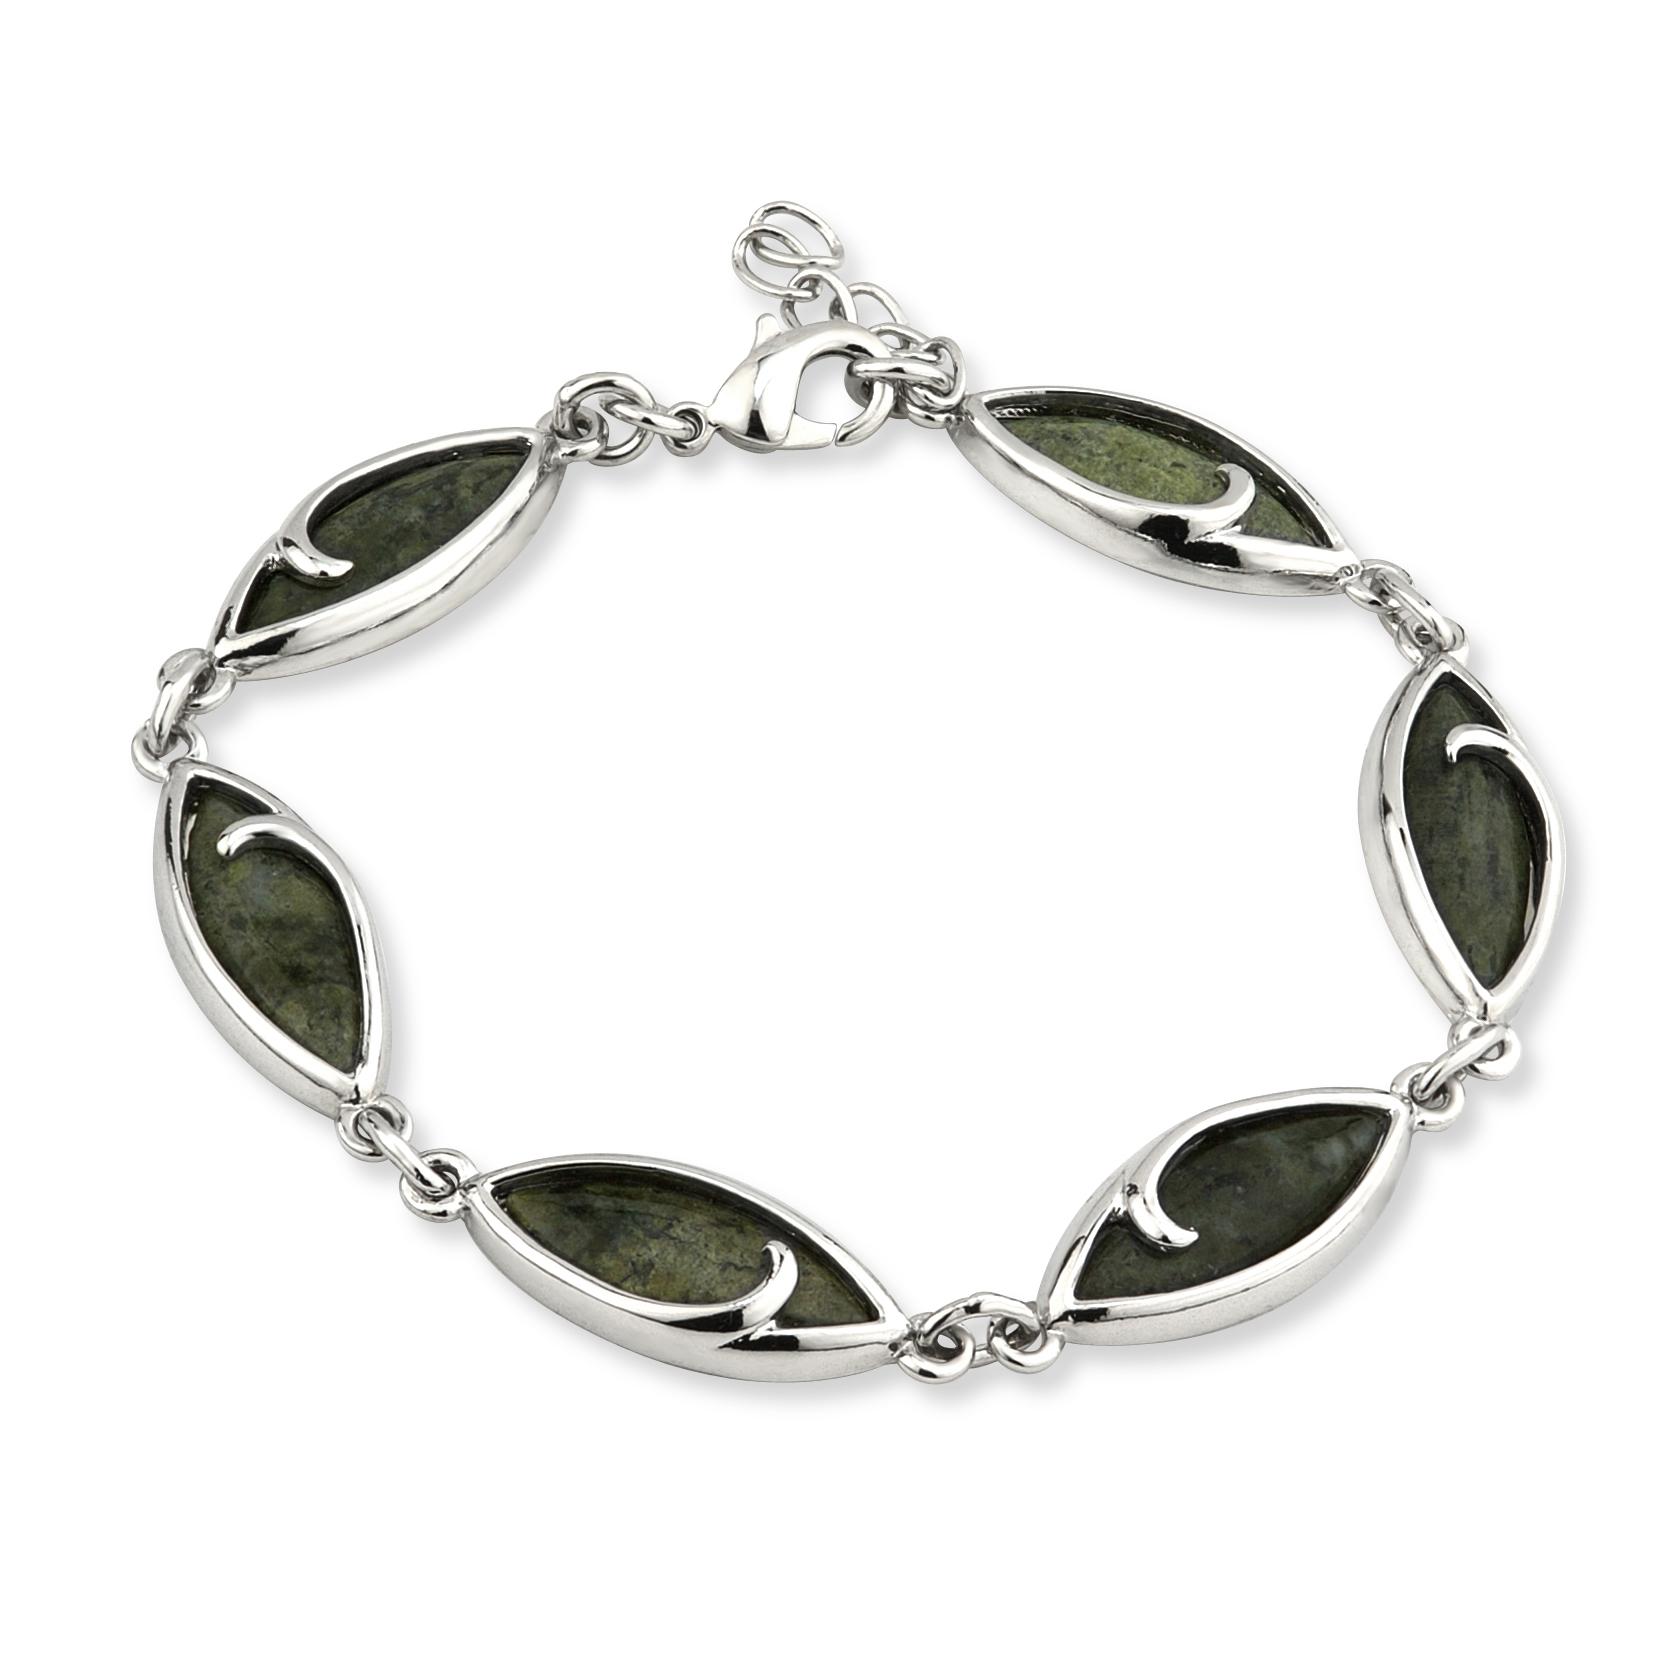 Connemara Marble Bracelet S5723